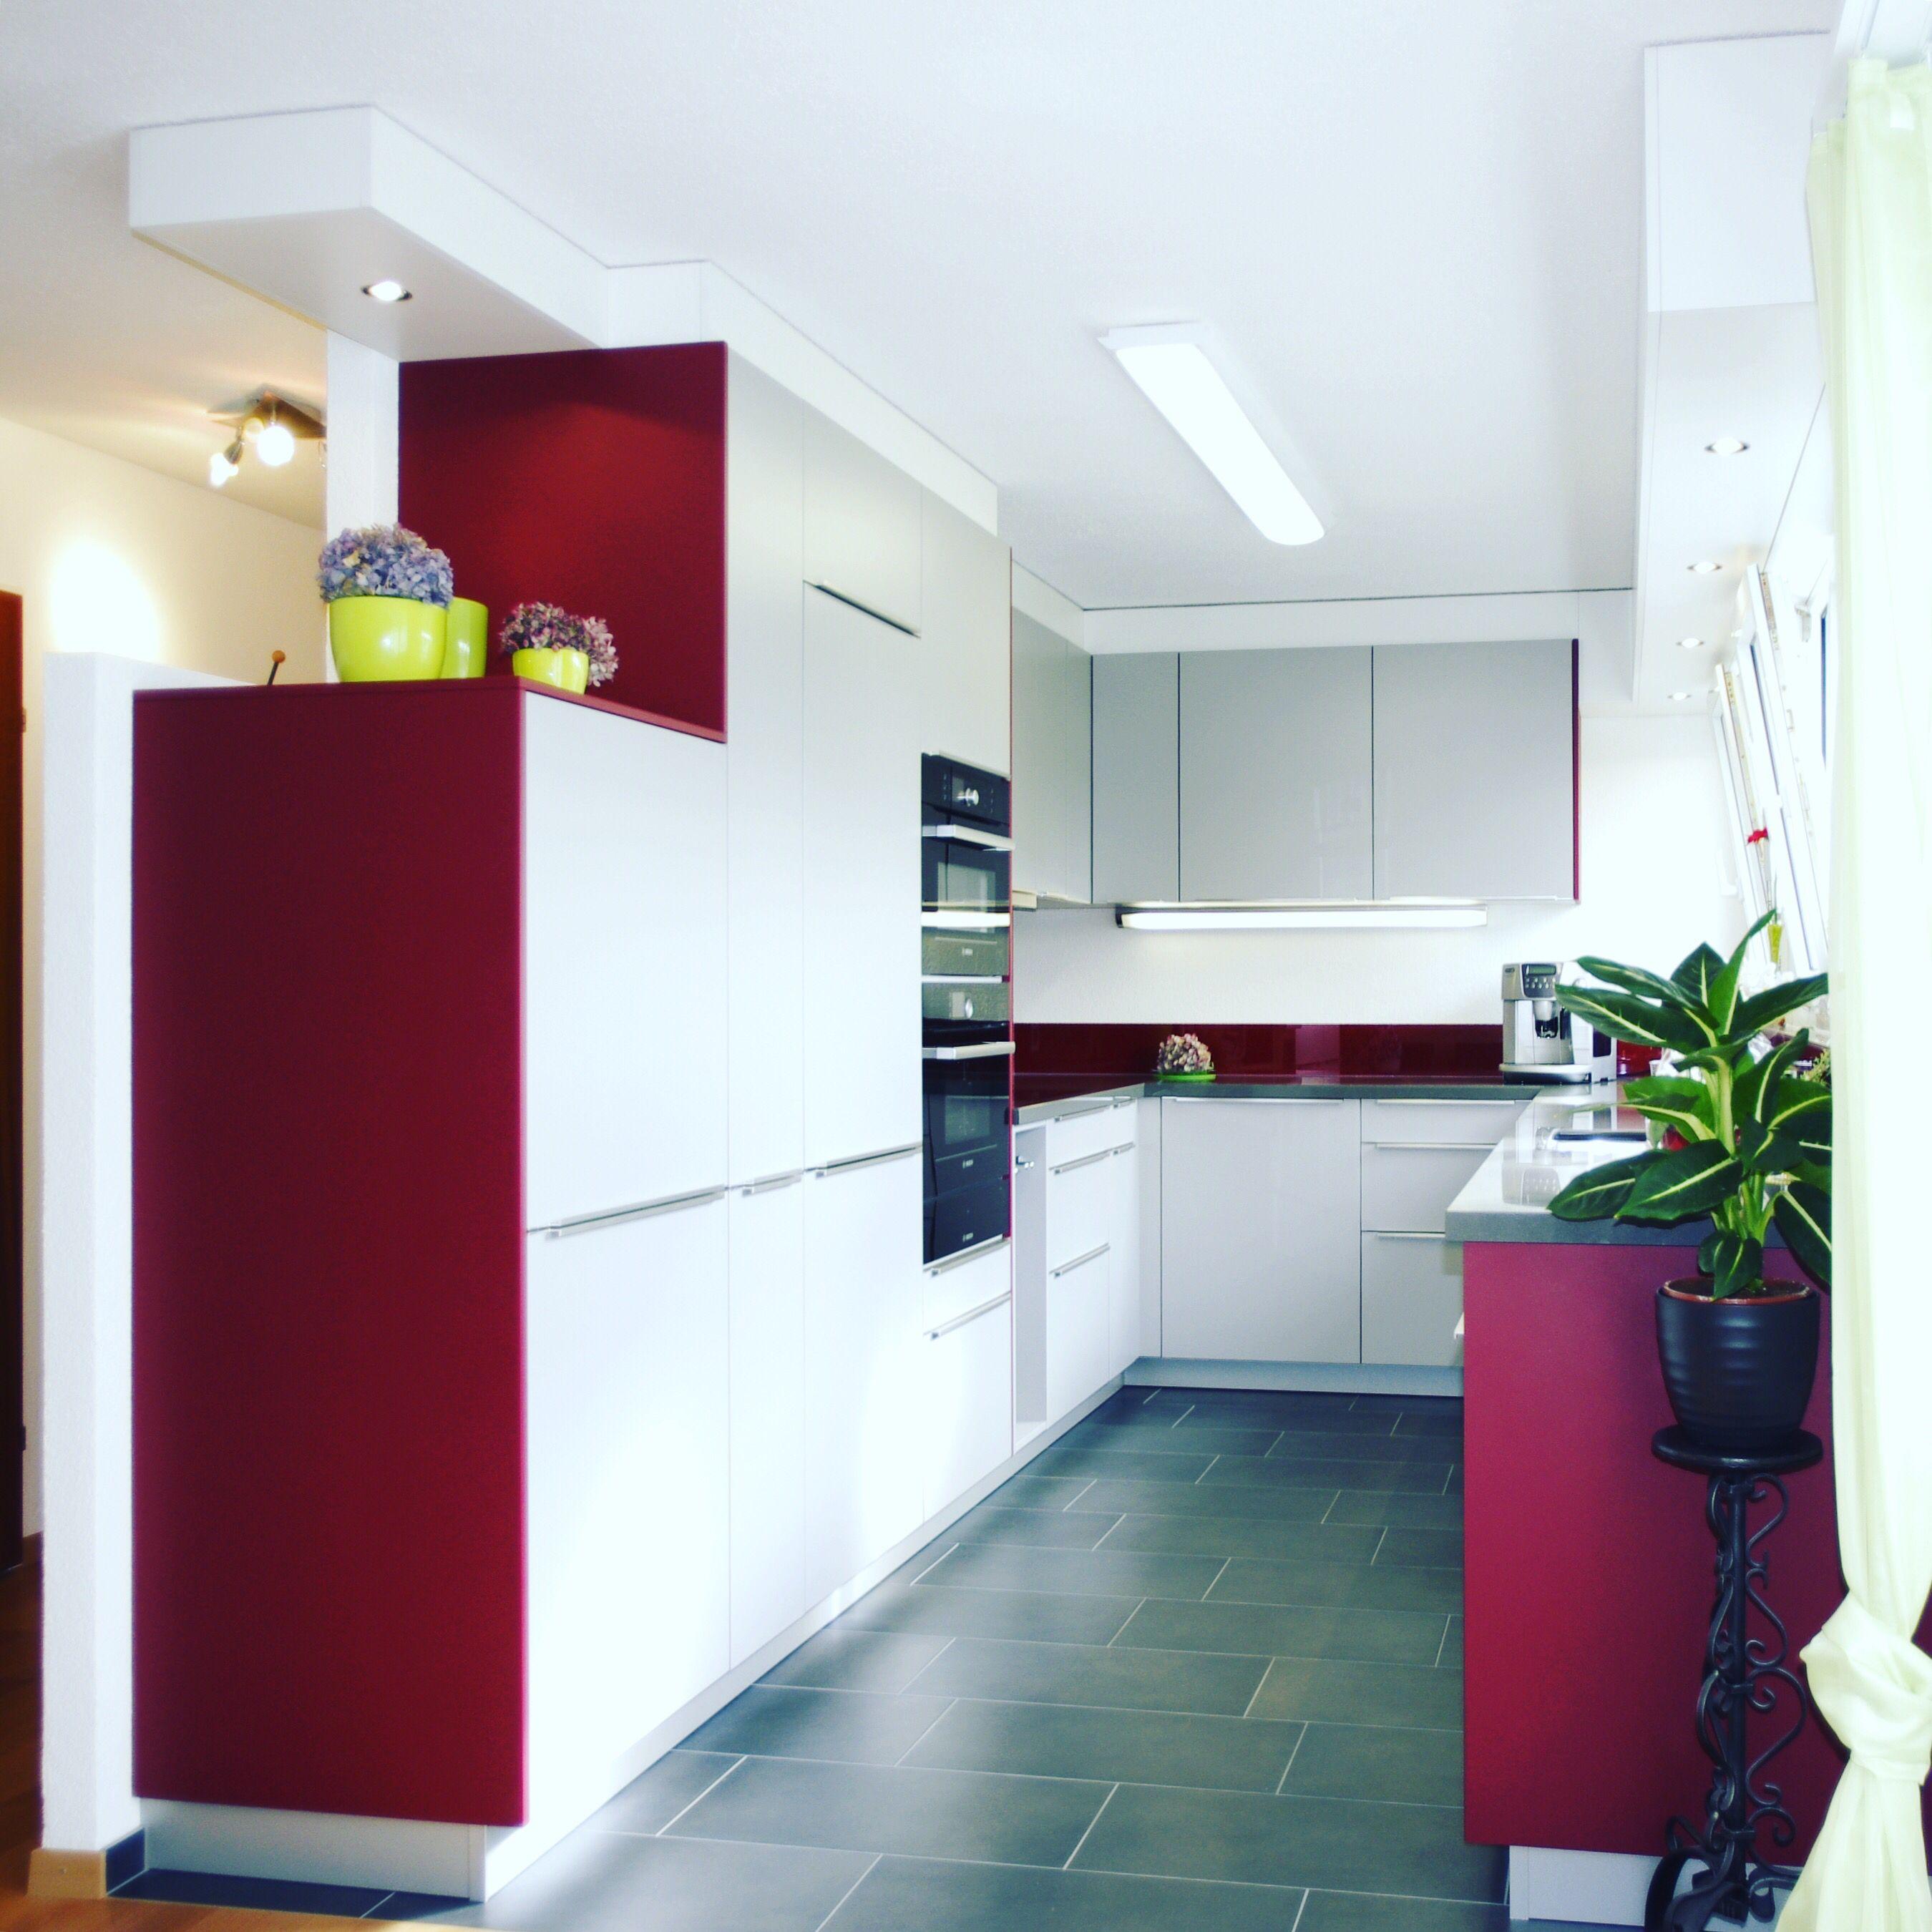 Region Aarau Design, Raumdesign, Küche